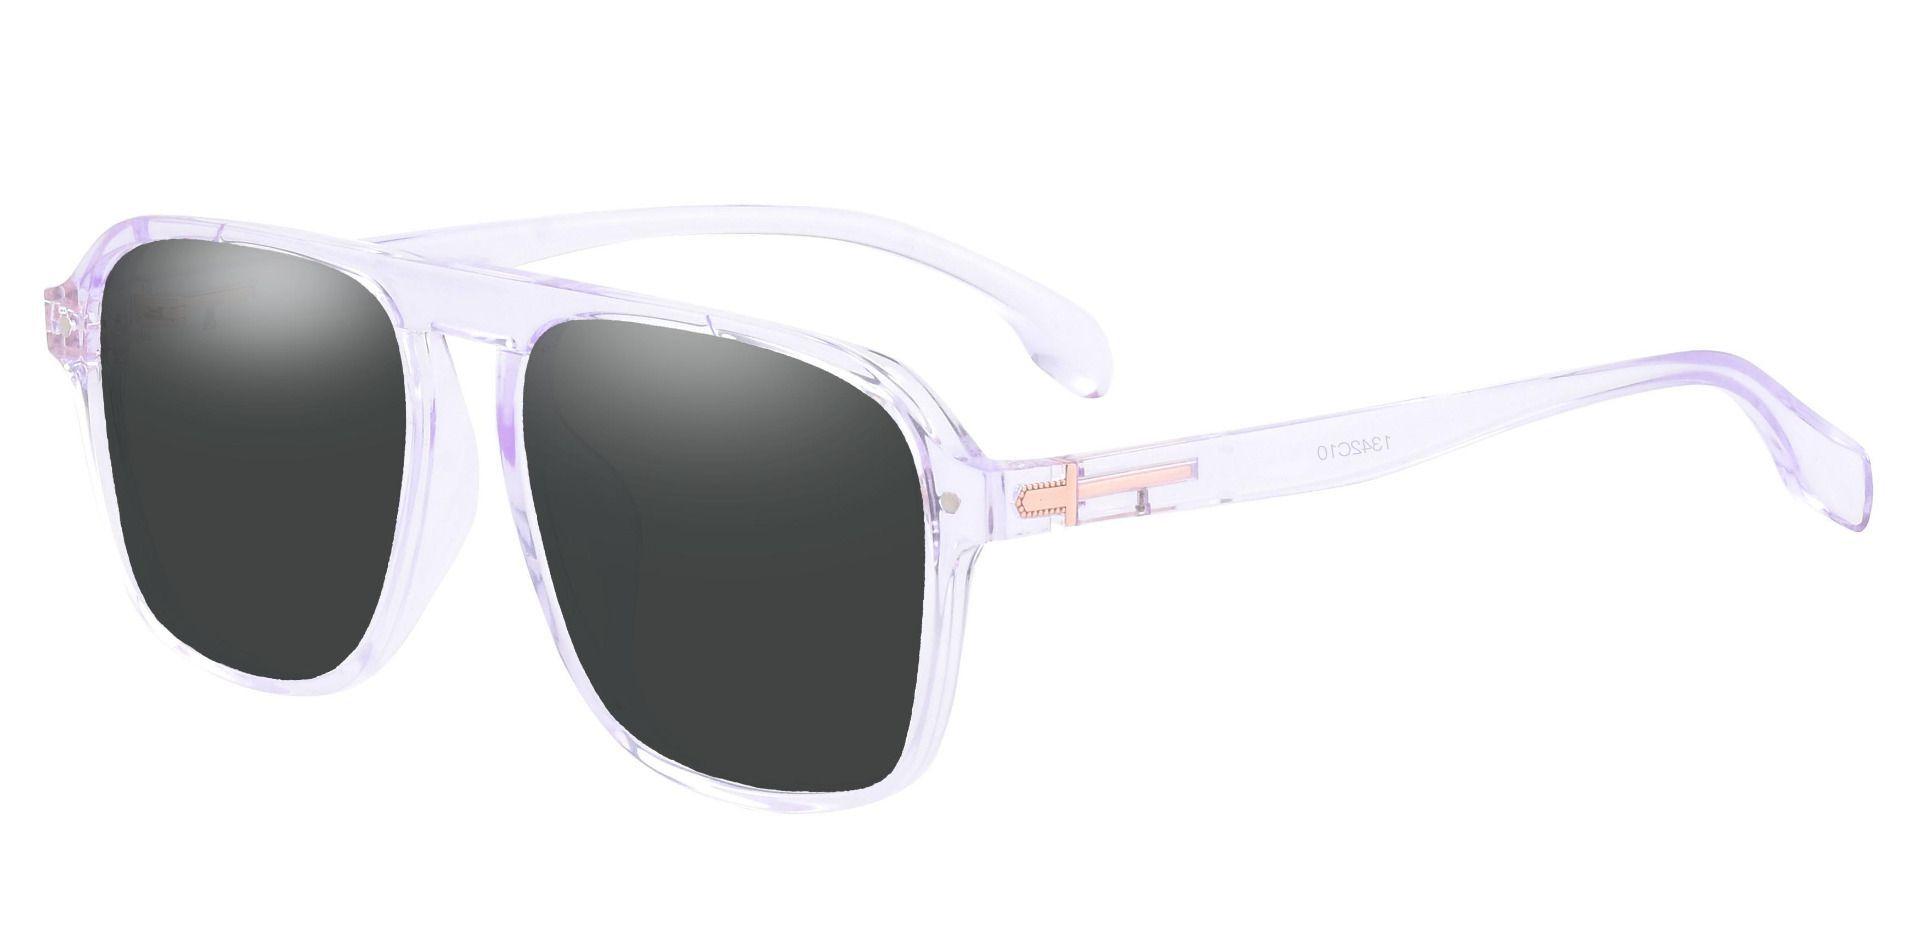 Gideon Aviator Prescription Sunglasses - Clear Frame With Gray Lenses